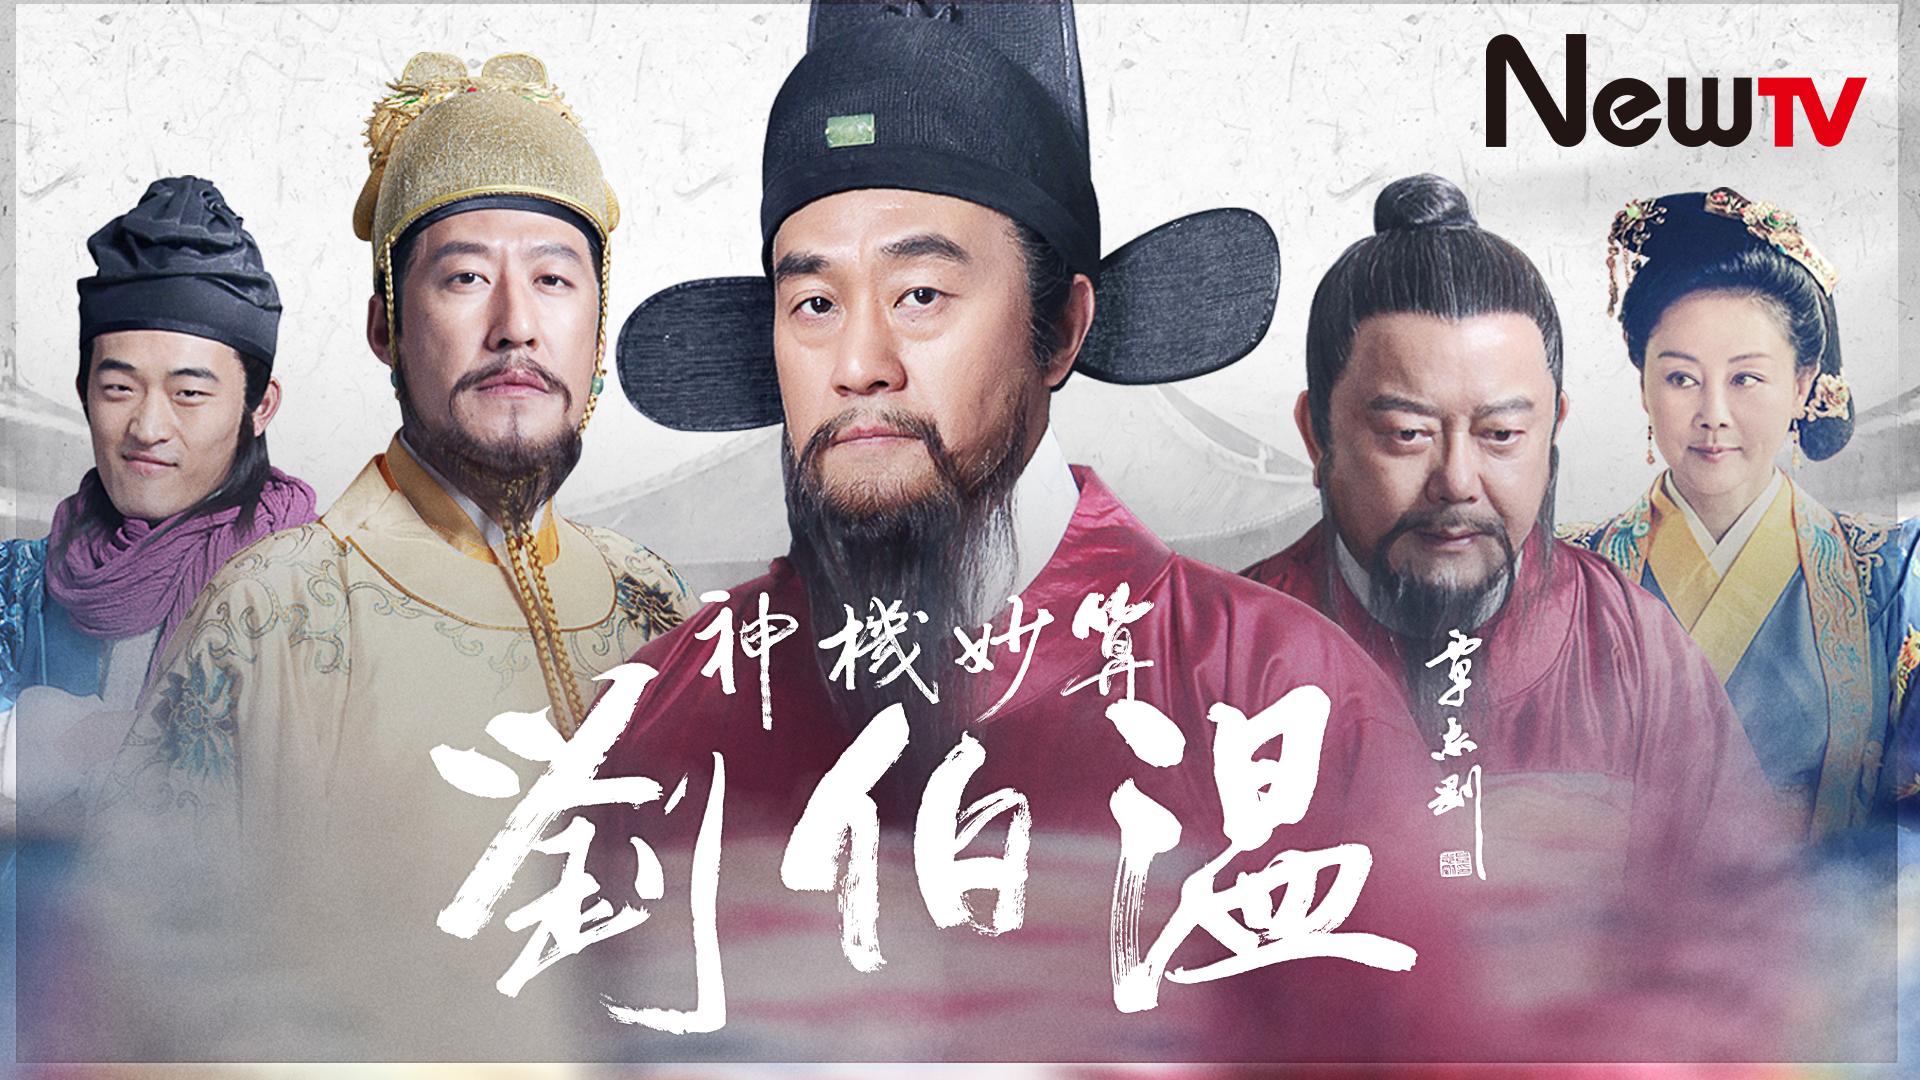 Foresighted Liu Bo Wen